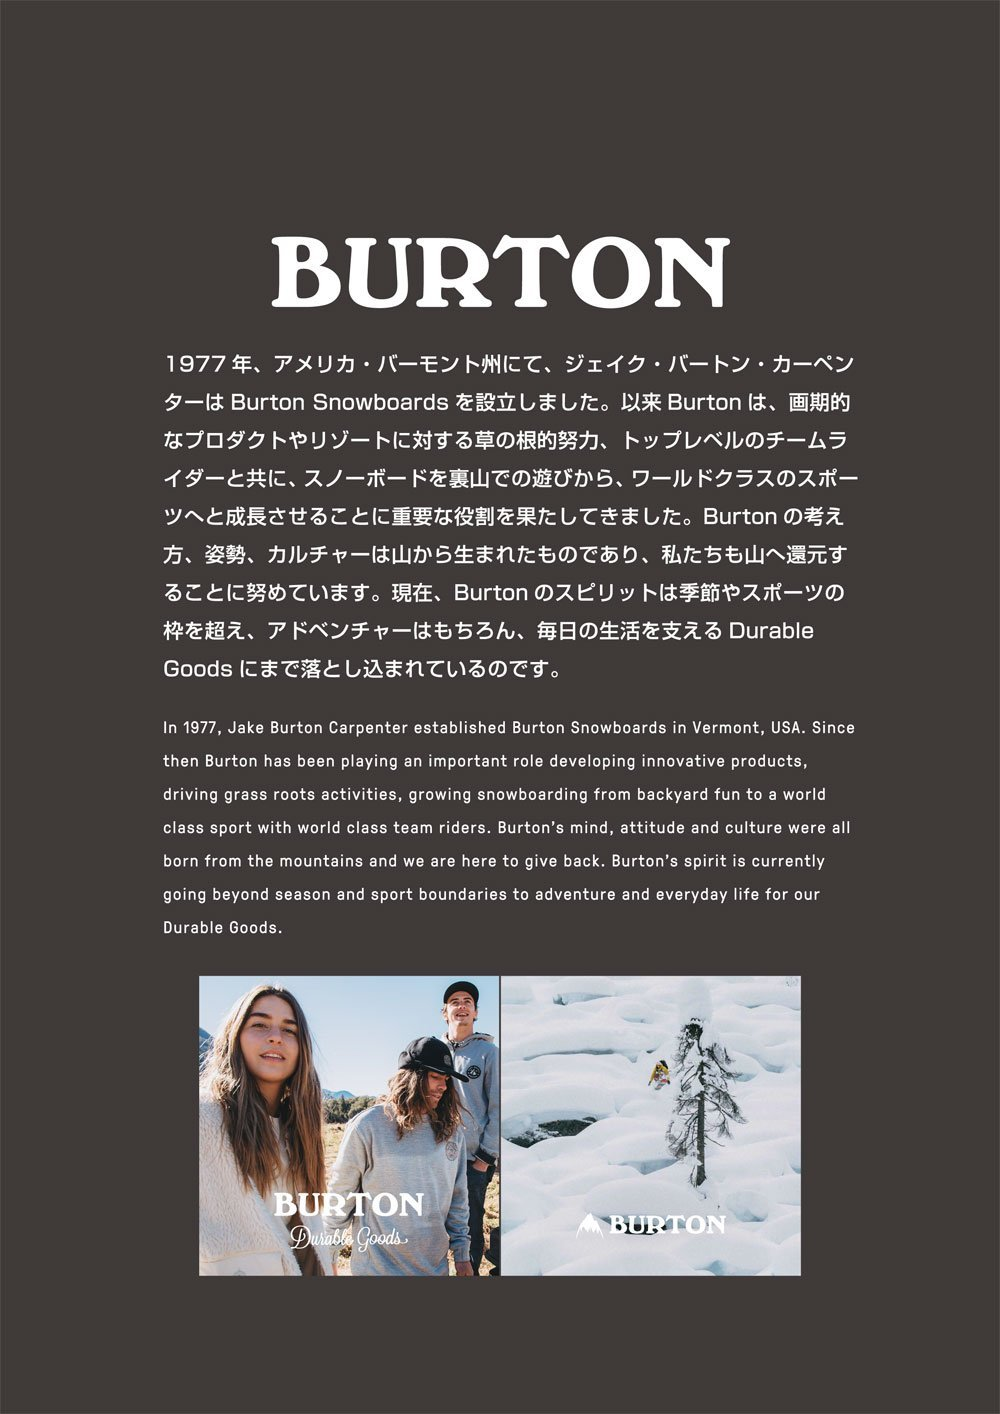 Burton Adultos Maleta Overnighter Roller